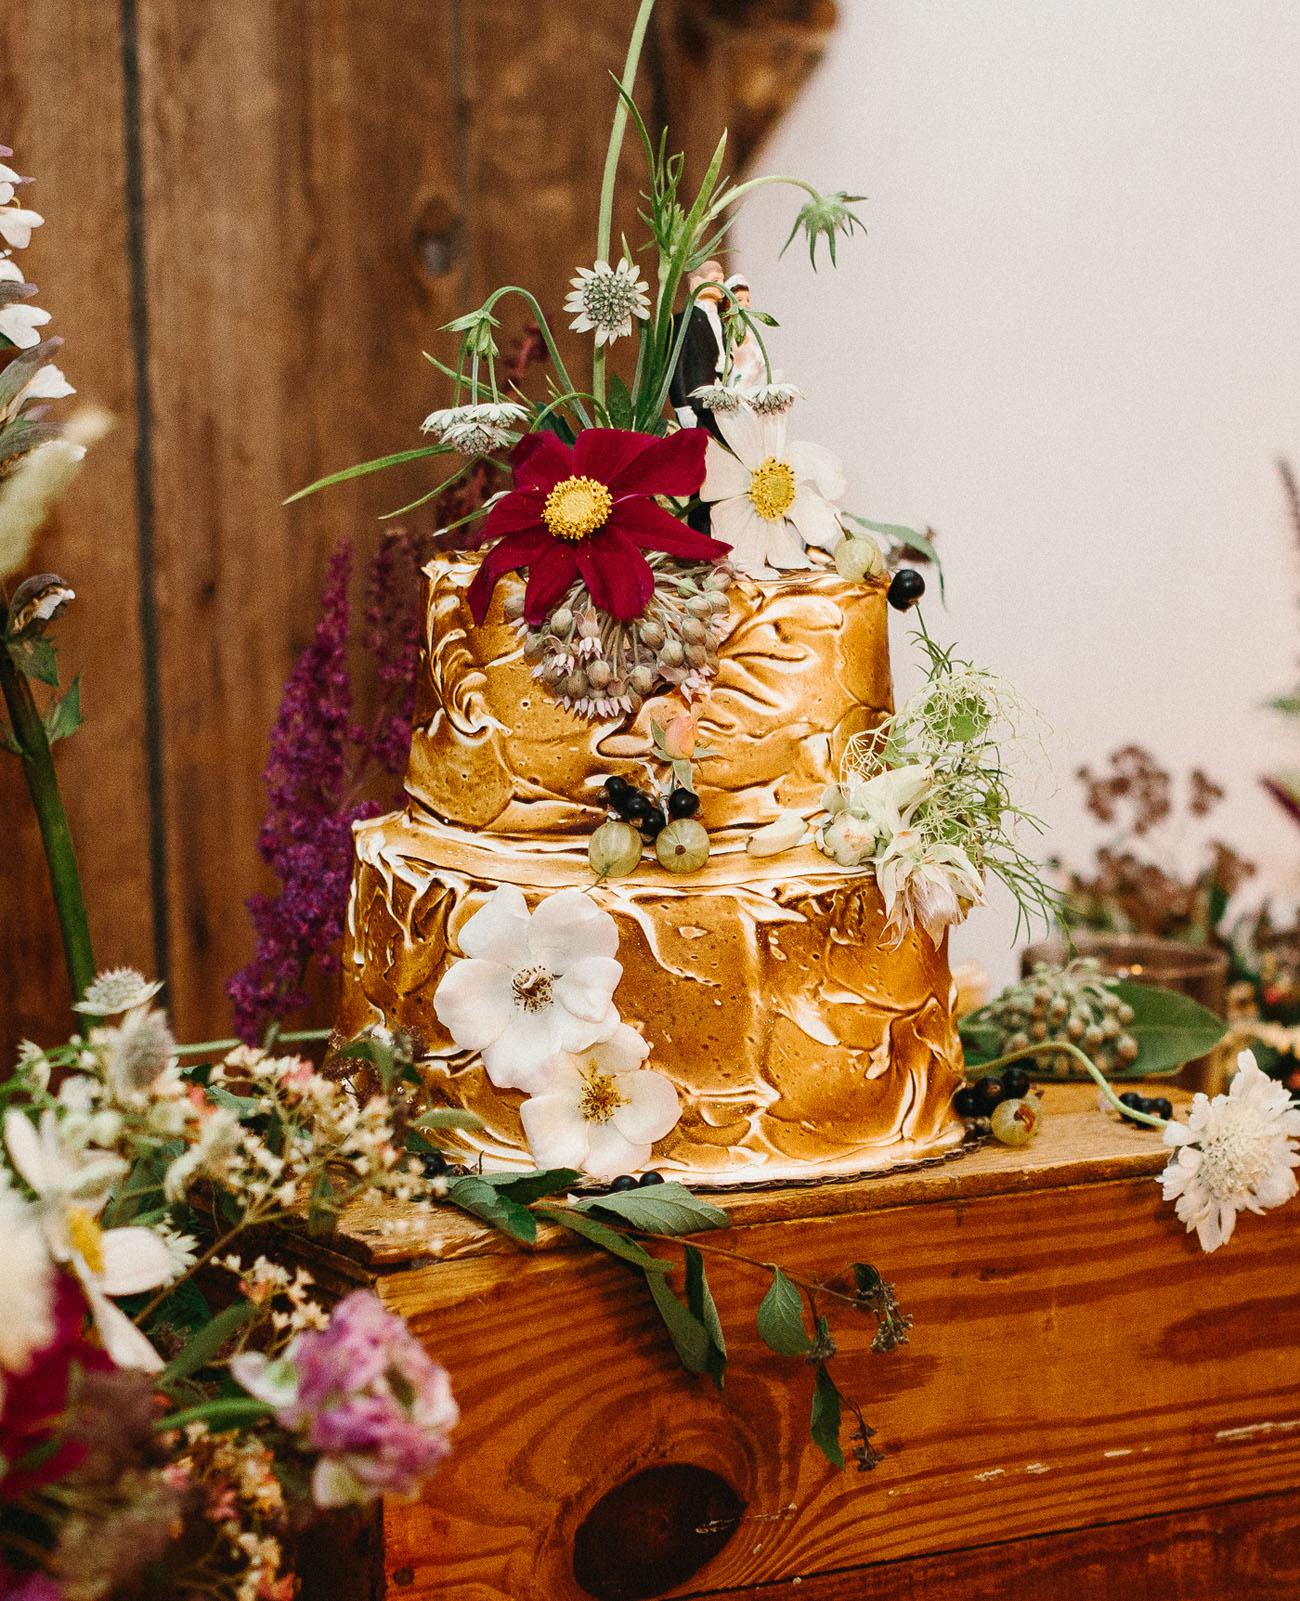 Wedding cake by Sweetheart St. Johns via Green Wedding Shoes